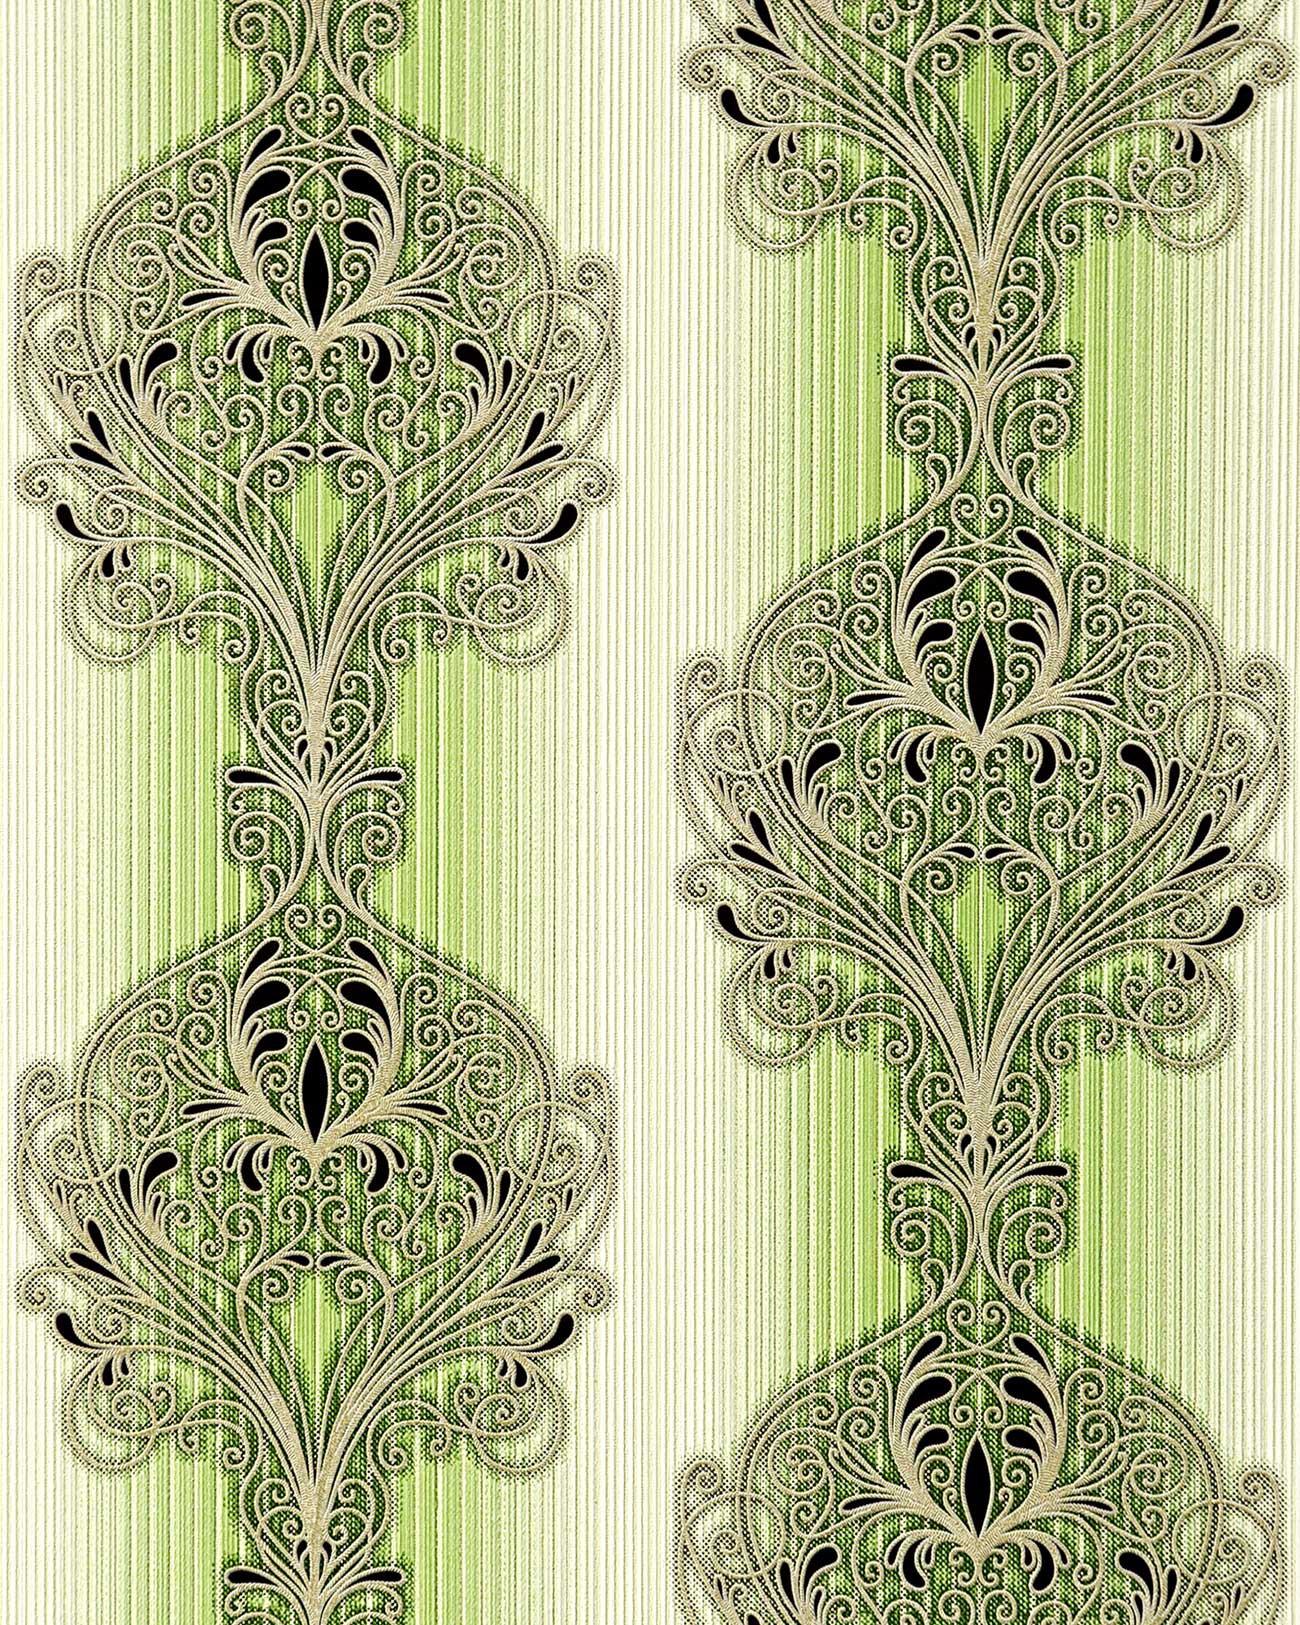 Papier Peint Baroque Damasse Ornement Moderne Et Orne Edem 096 25